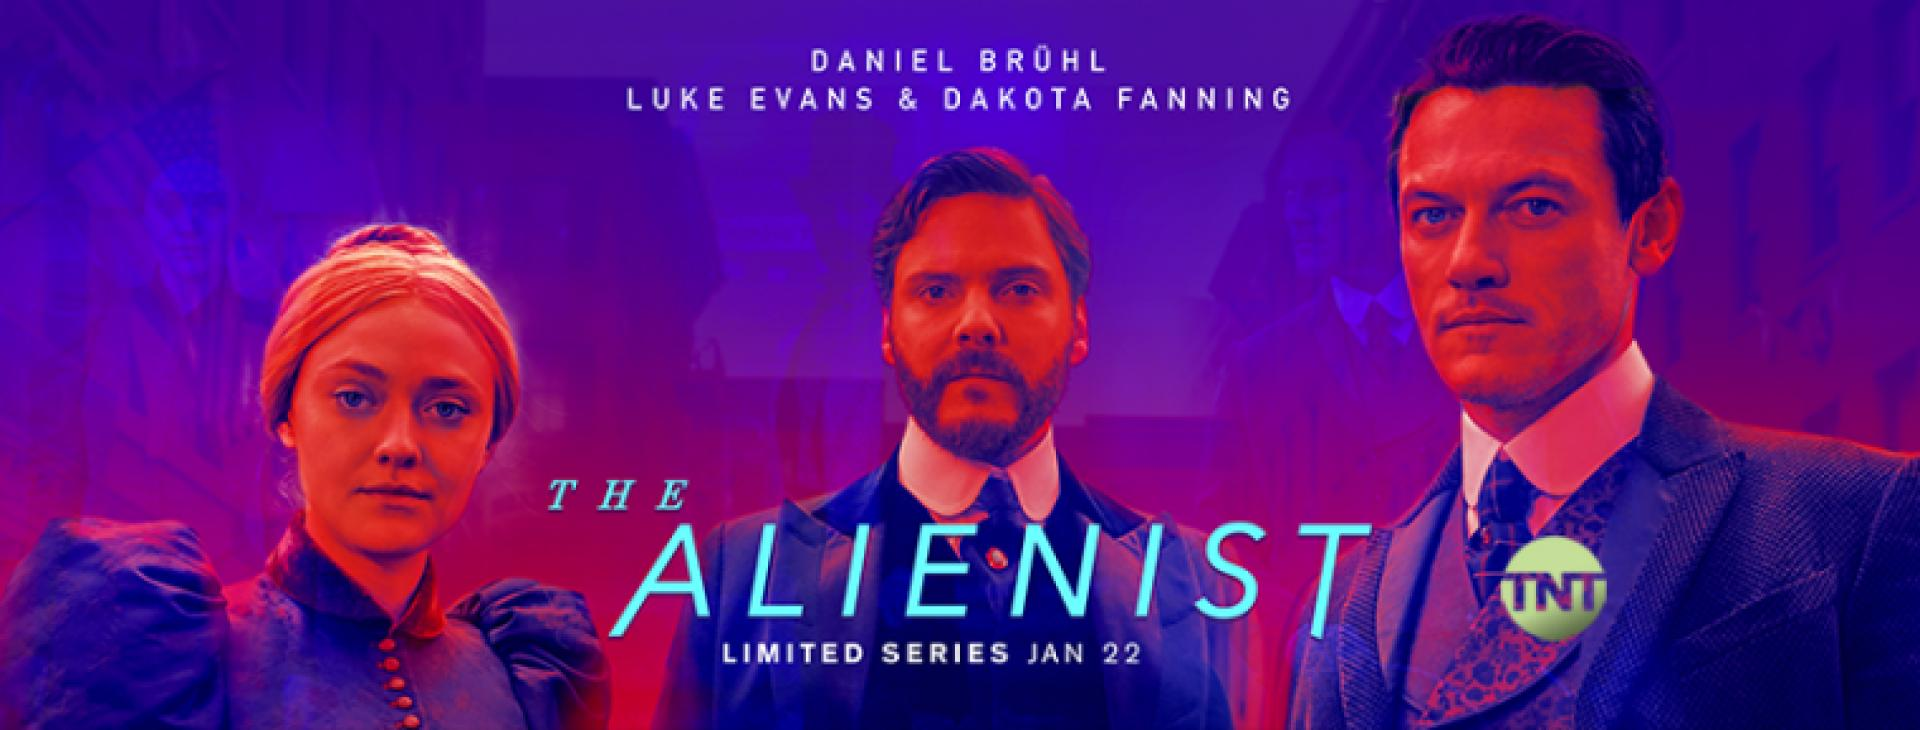 The Alienist (2018) - 1x04-06